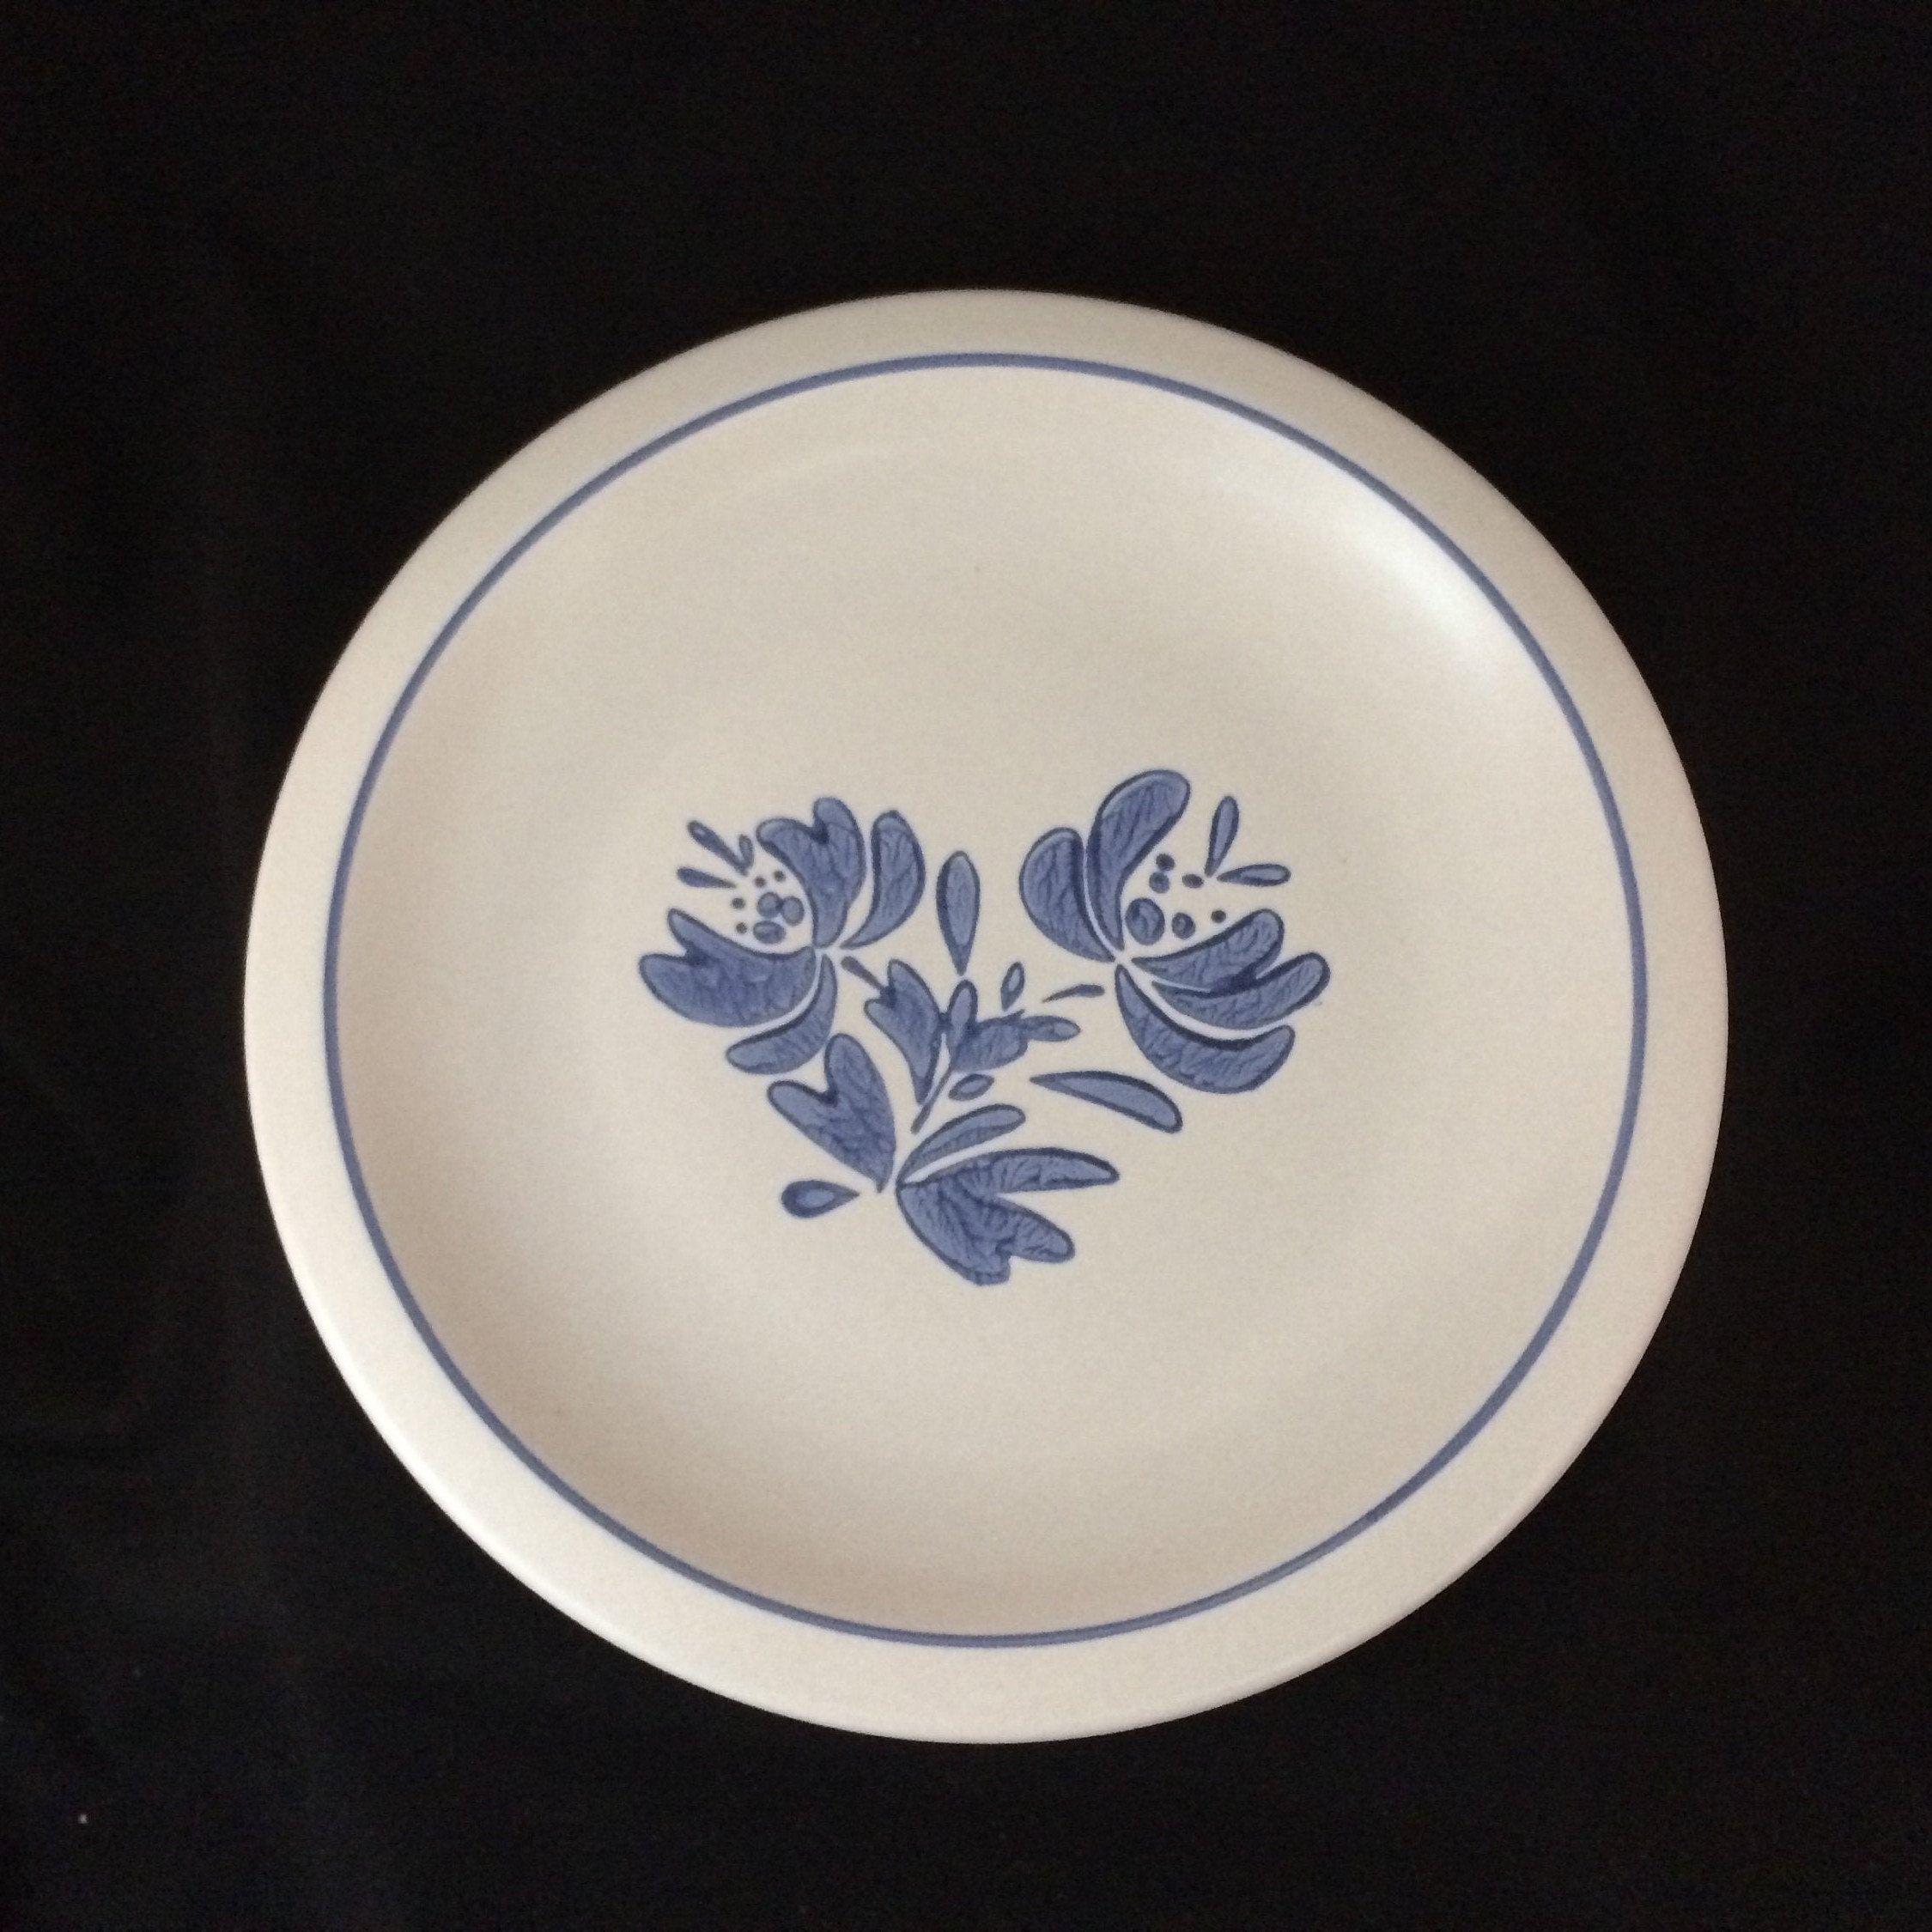 Pfaltzgraff Yorktowne Large Dinner Plate Vintage Retro Folk Art Classic Dinnerware Blue Dishes Made In Usa Fre In 2020 Classic Dinnerware Blue Dinnerware Blue Dishes